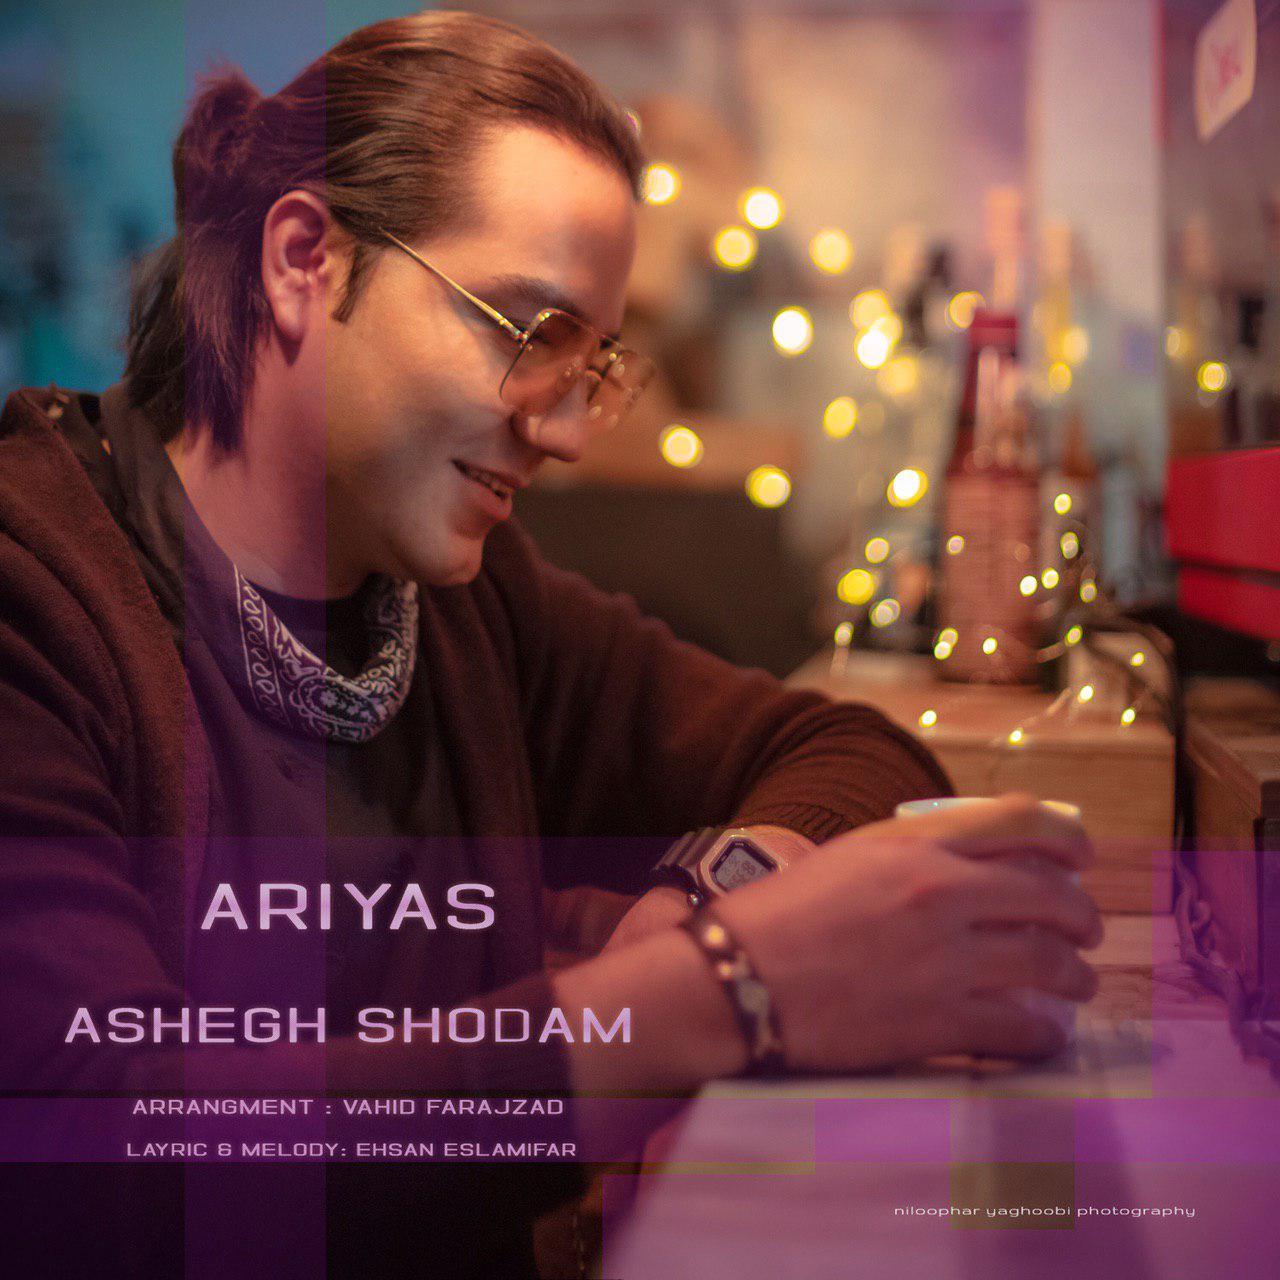 Ariyas – Ashegh Shodam